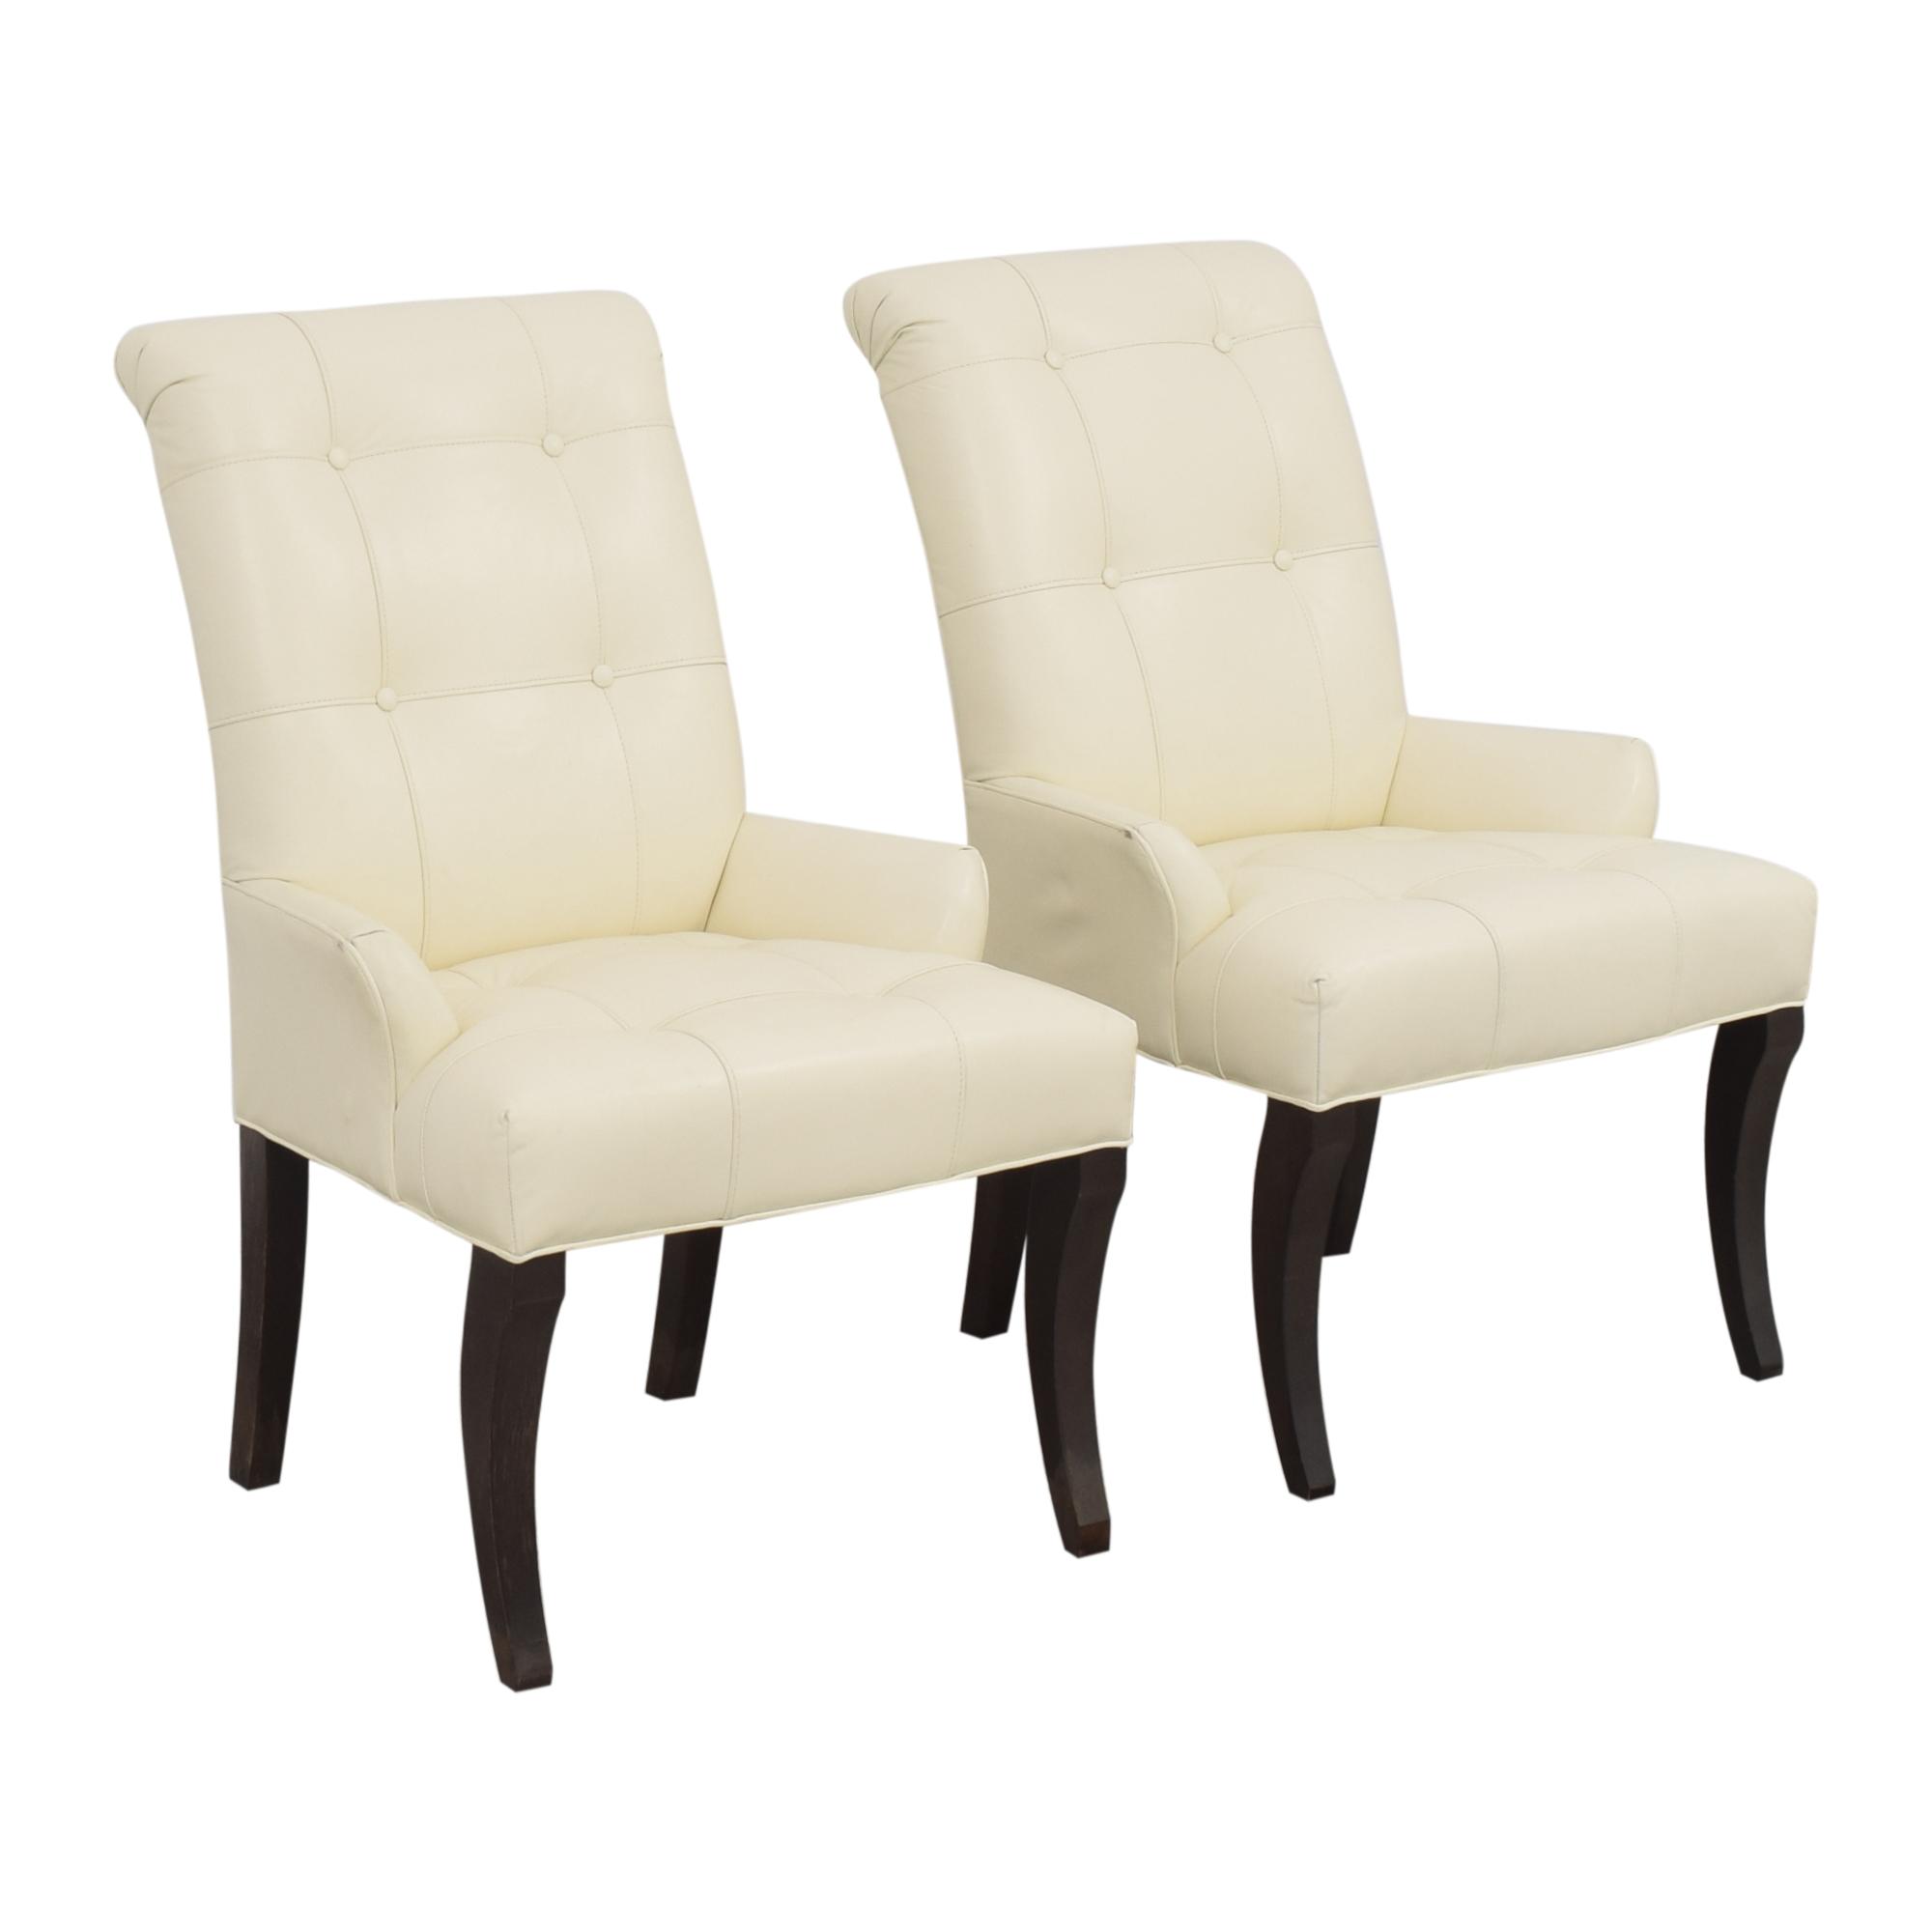 shop Ethan Allen Ethan Allen Verlaine Dining Armchairs online